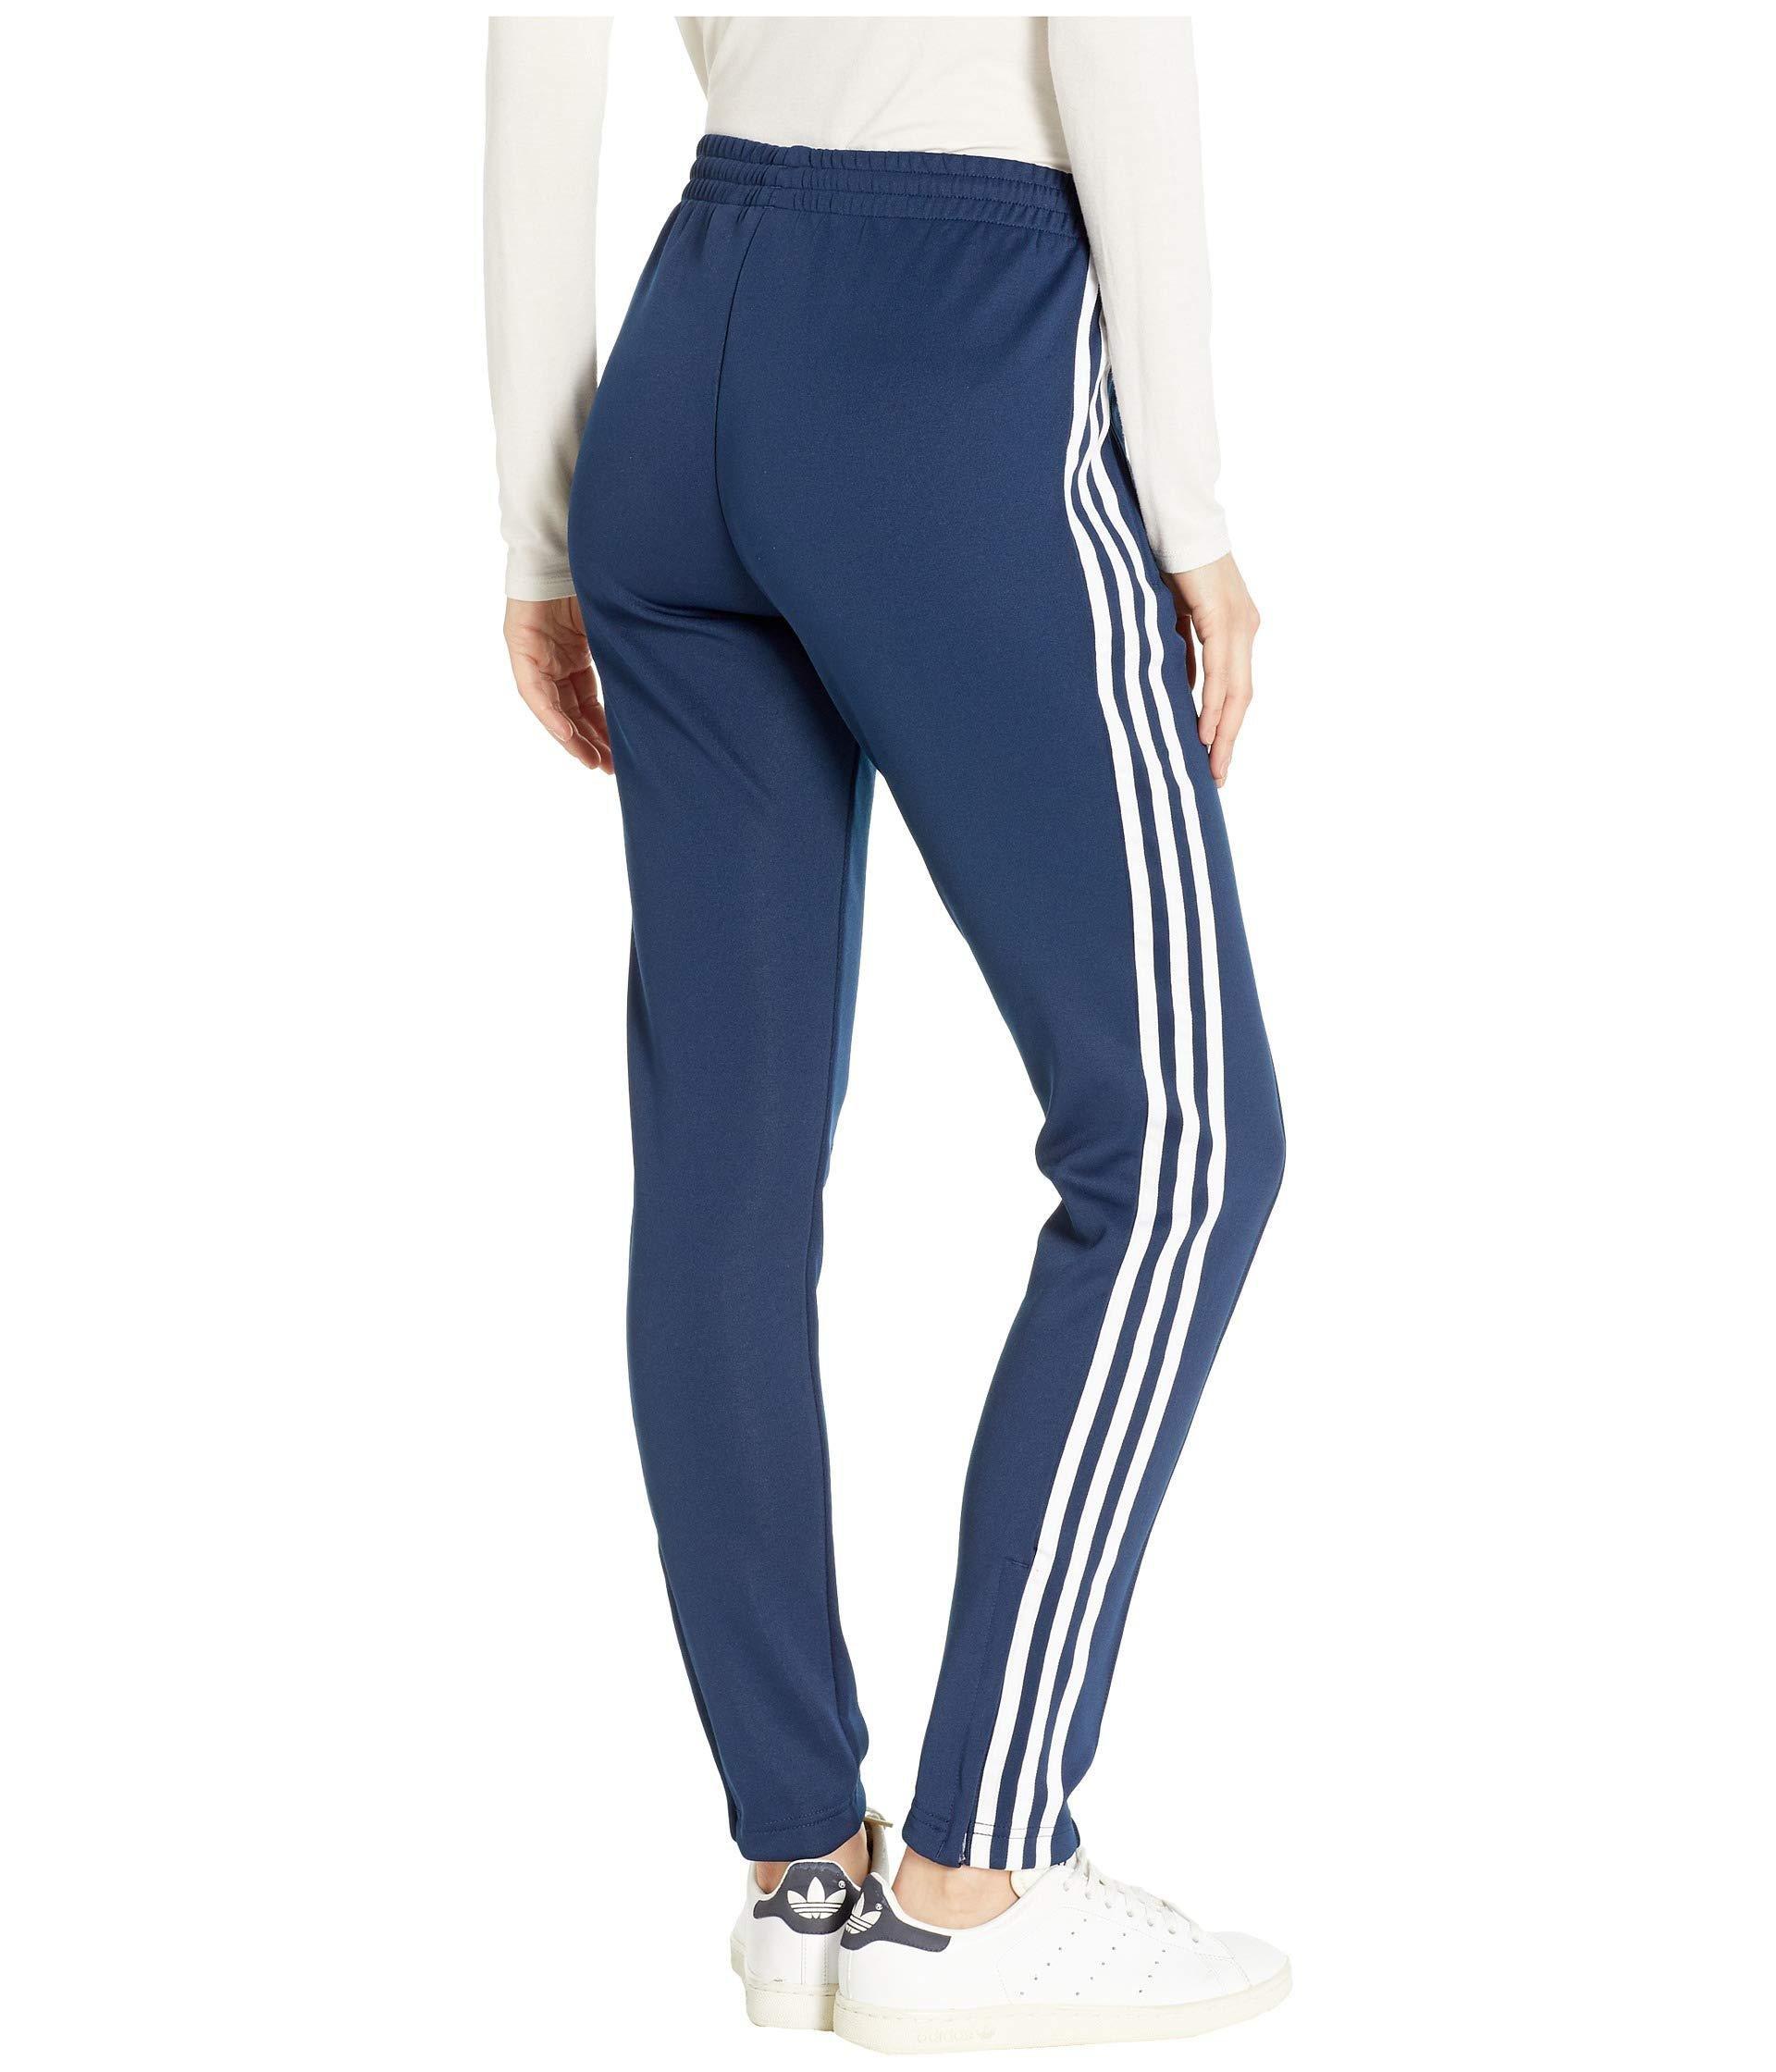 Adidas Originals Synthetic Sst Track Pants Dark Blue Women S